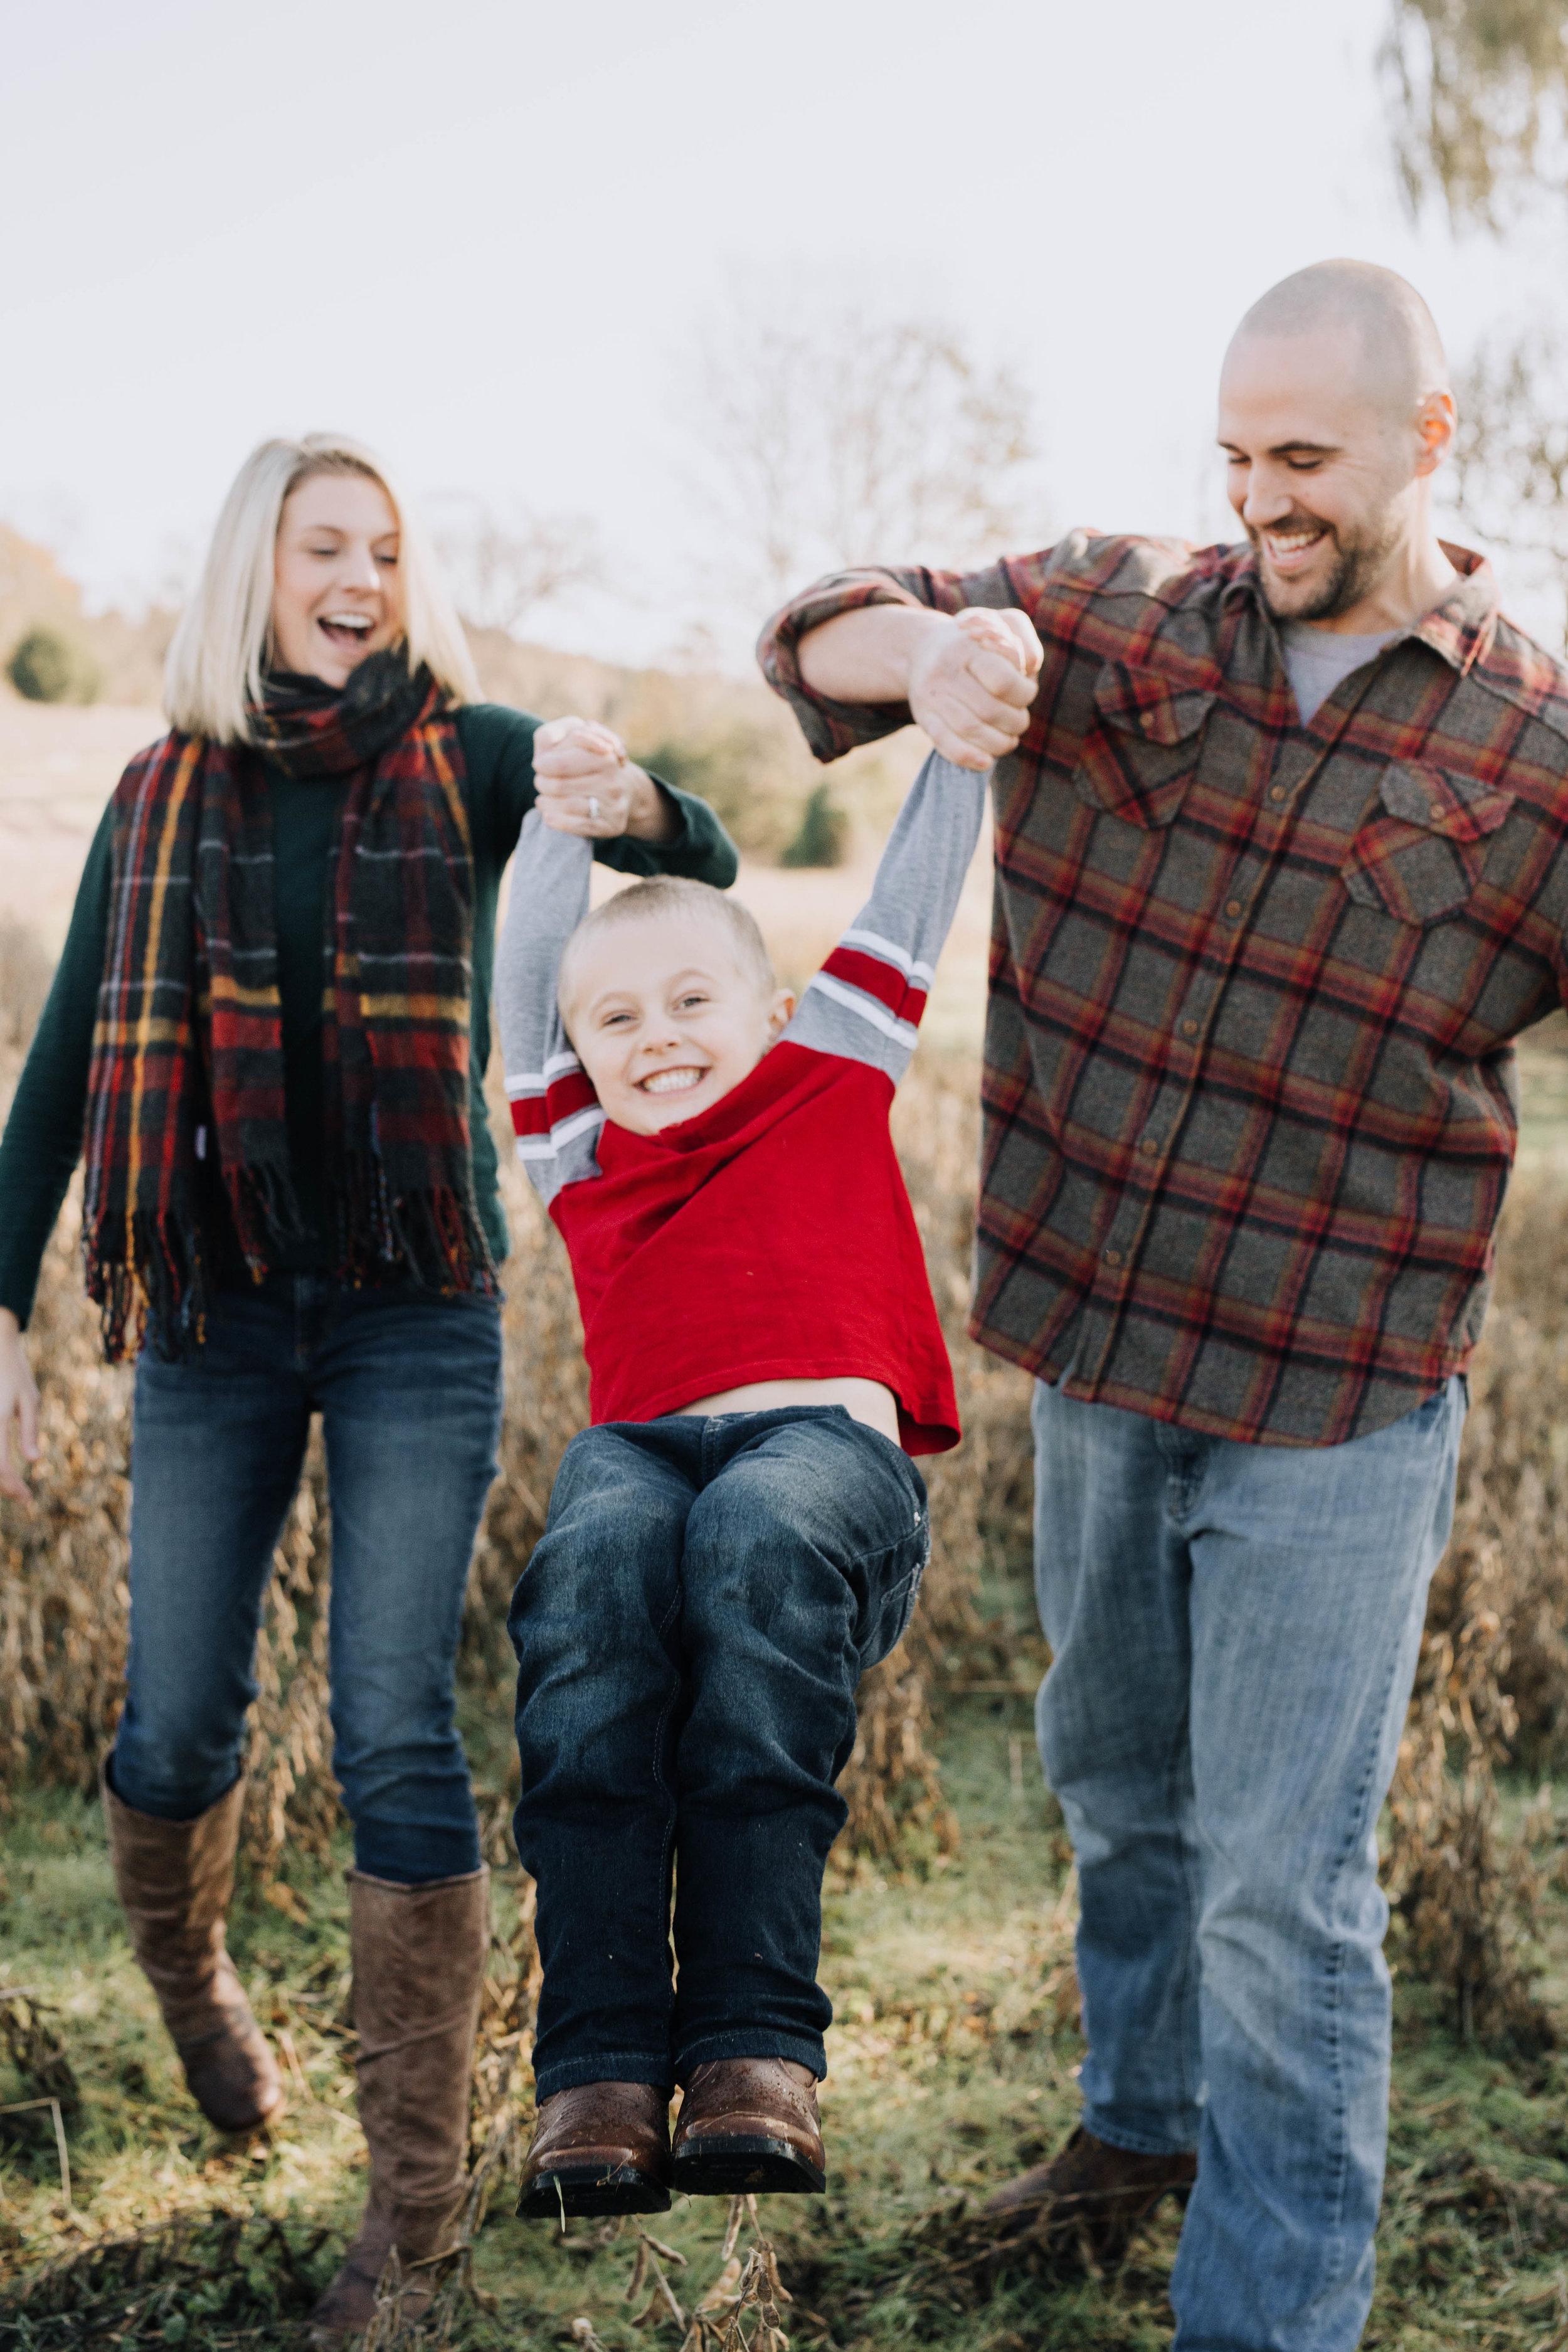 Lick_Run_Fredericksburg_Virginia_Jacqueline_Waters_Photography_Basham_Family_Portraits (33).jpg